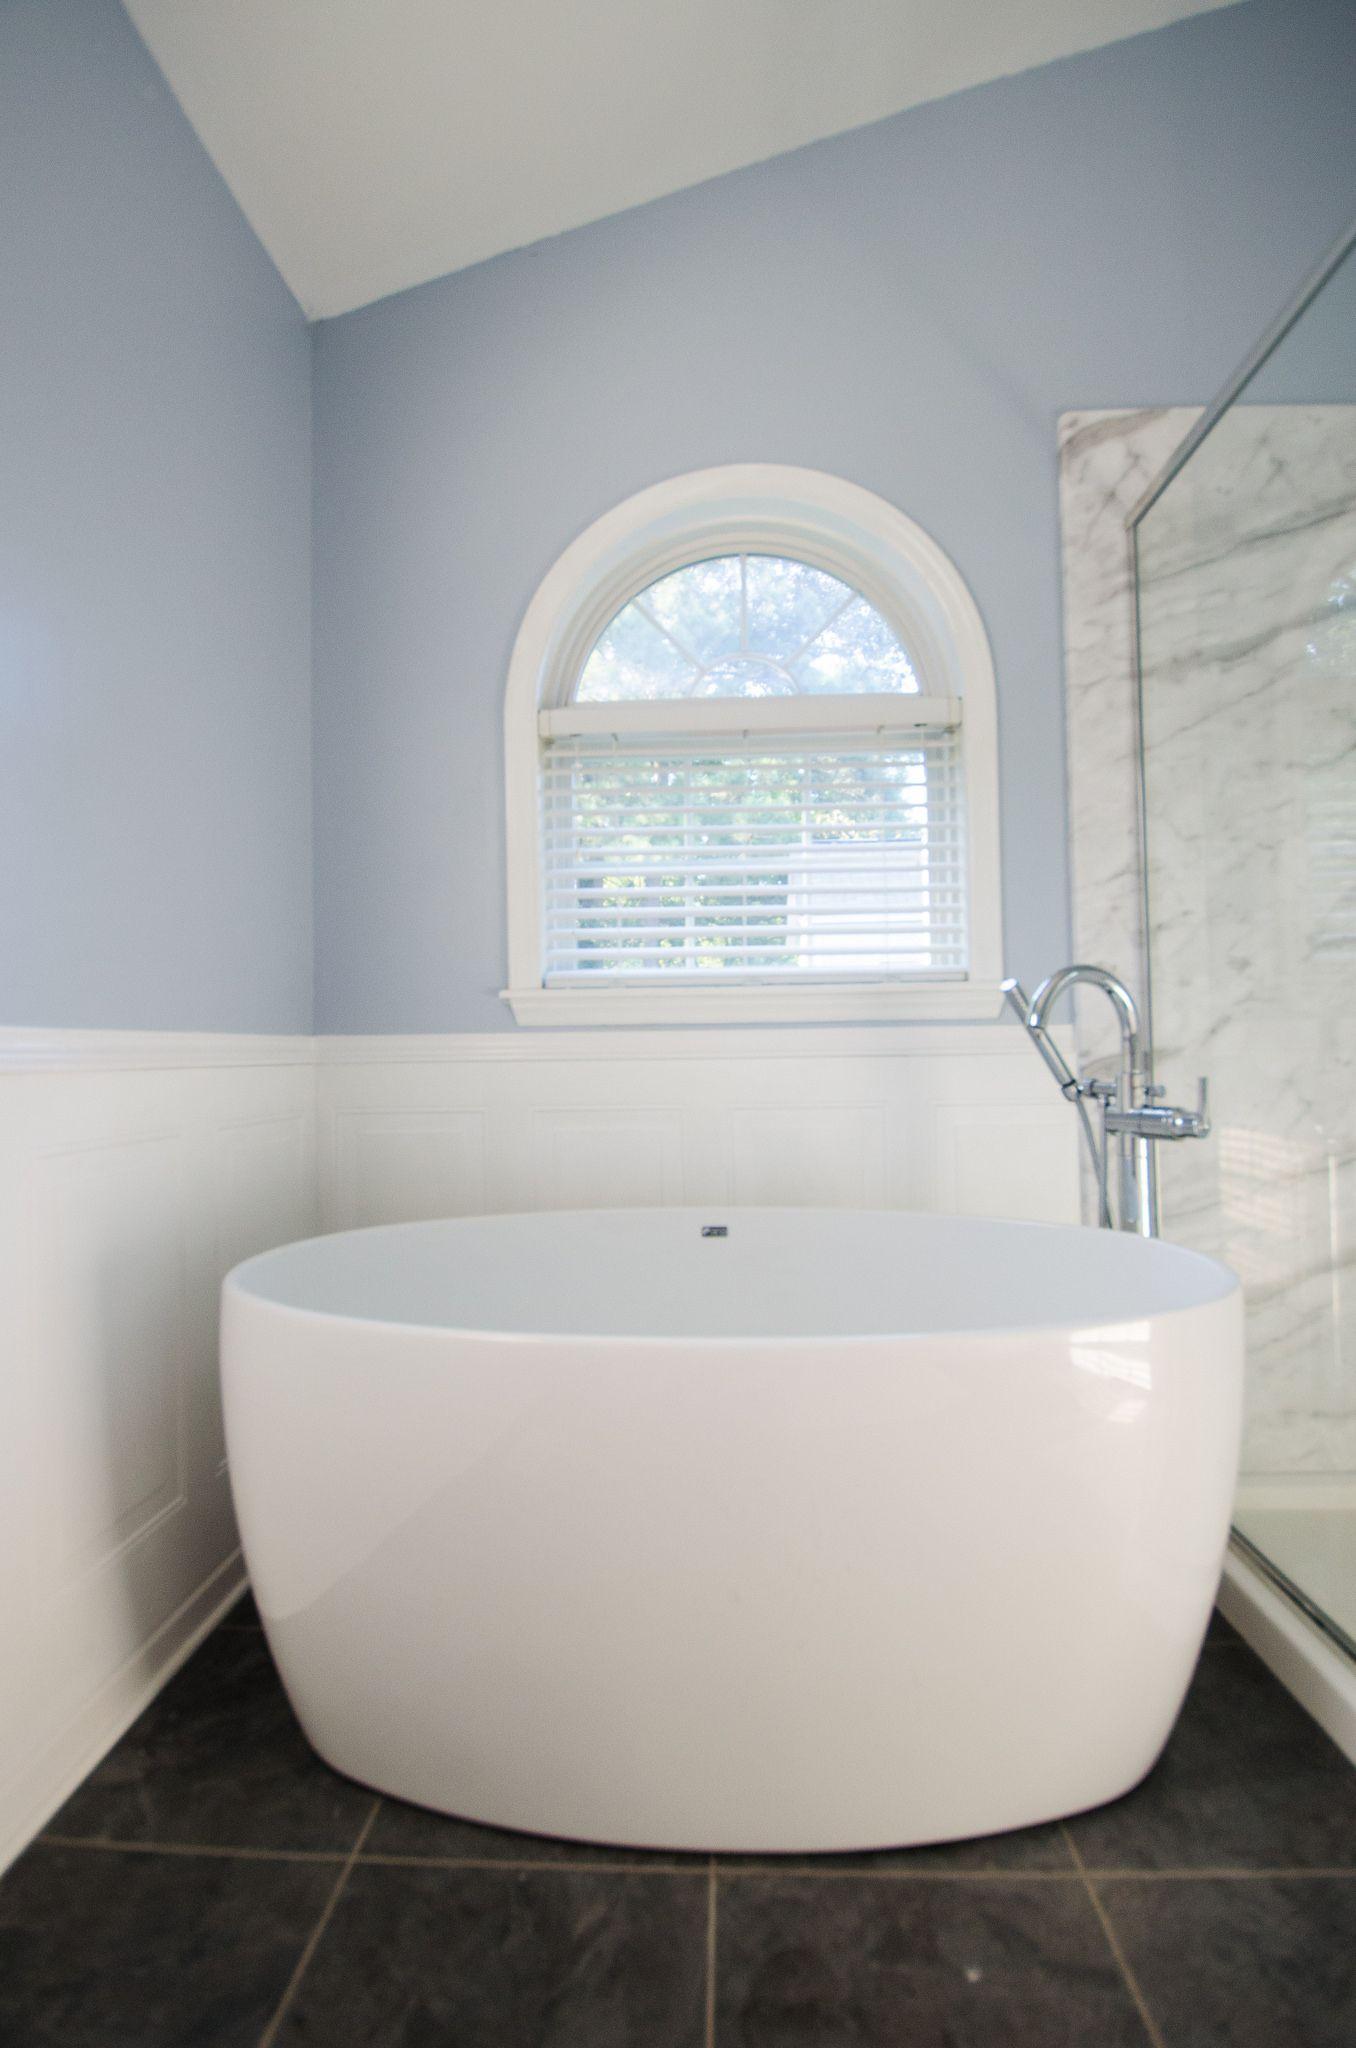 JB515- After-1   Re-Bath Remodels   Pinterest   Wainscoting bathroom ...